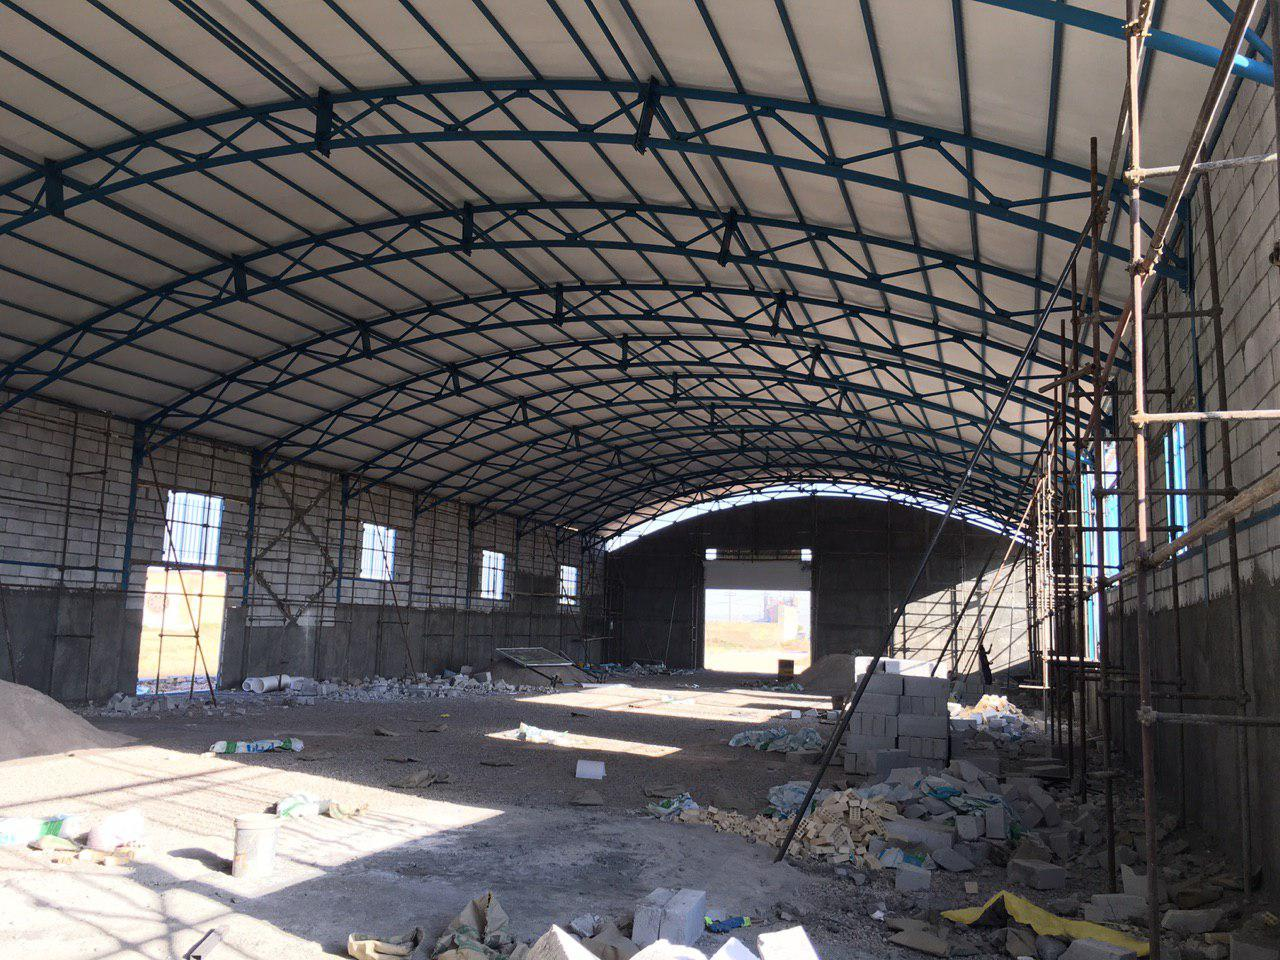 industrial shed 28 - آشنایی کامل با سوله و انواع مختلف آن | سوله سبک بیستون